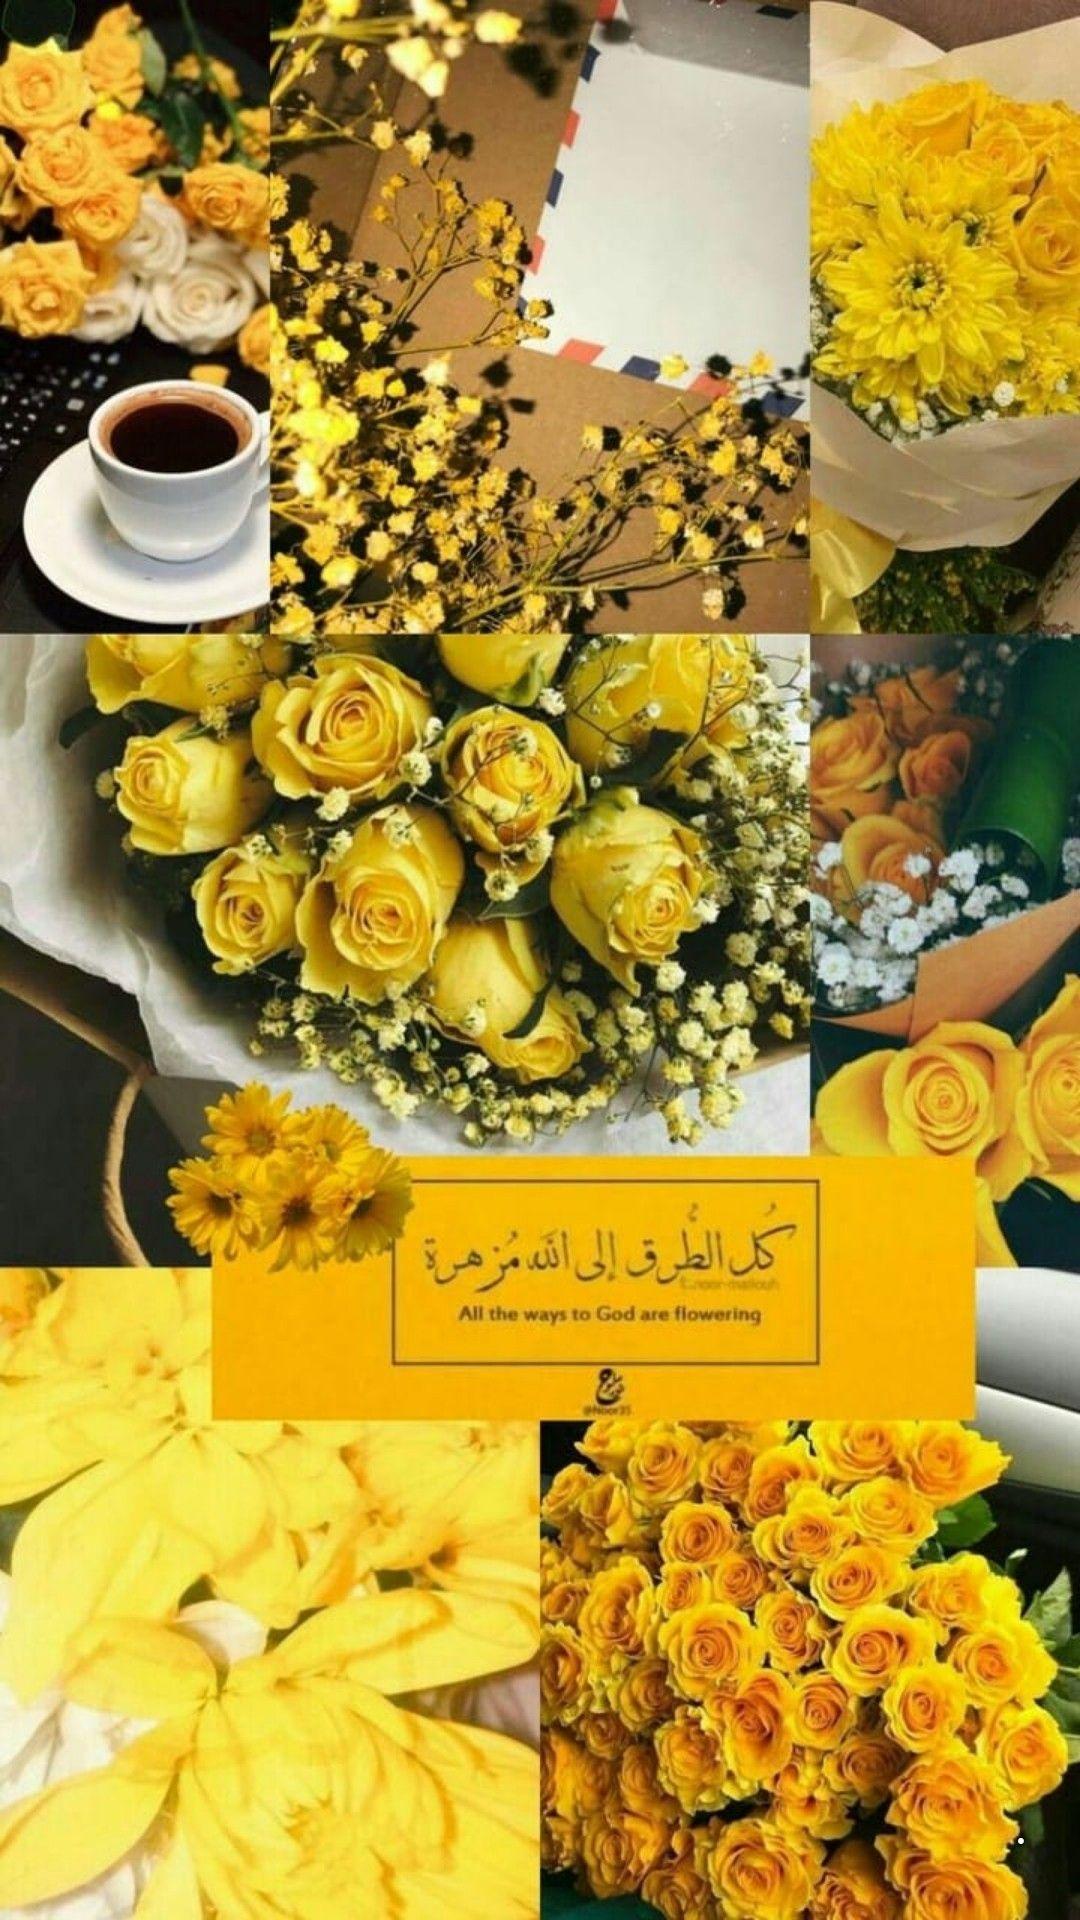 كل الطرق الى الله مزهرة Iphone Wallpaper Quotes Love Love Quotes Wallpaper Nature Iphone Wallpaper